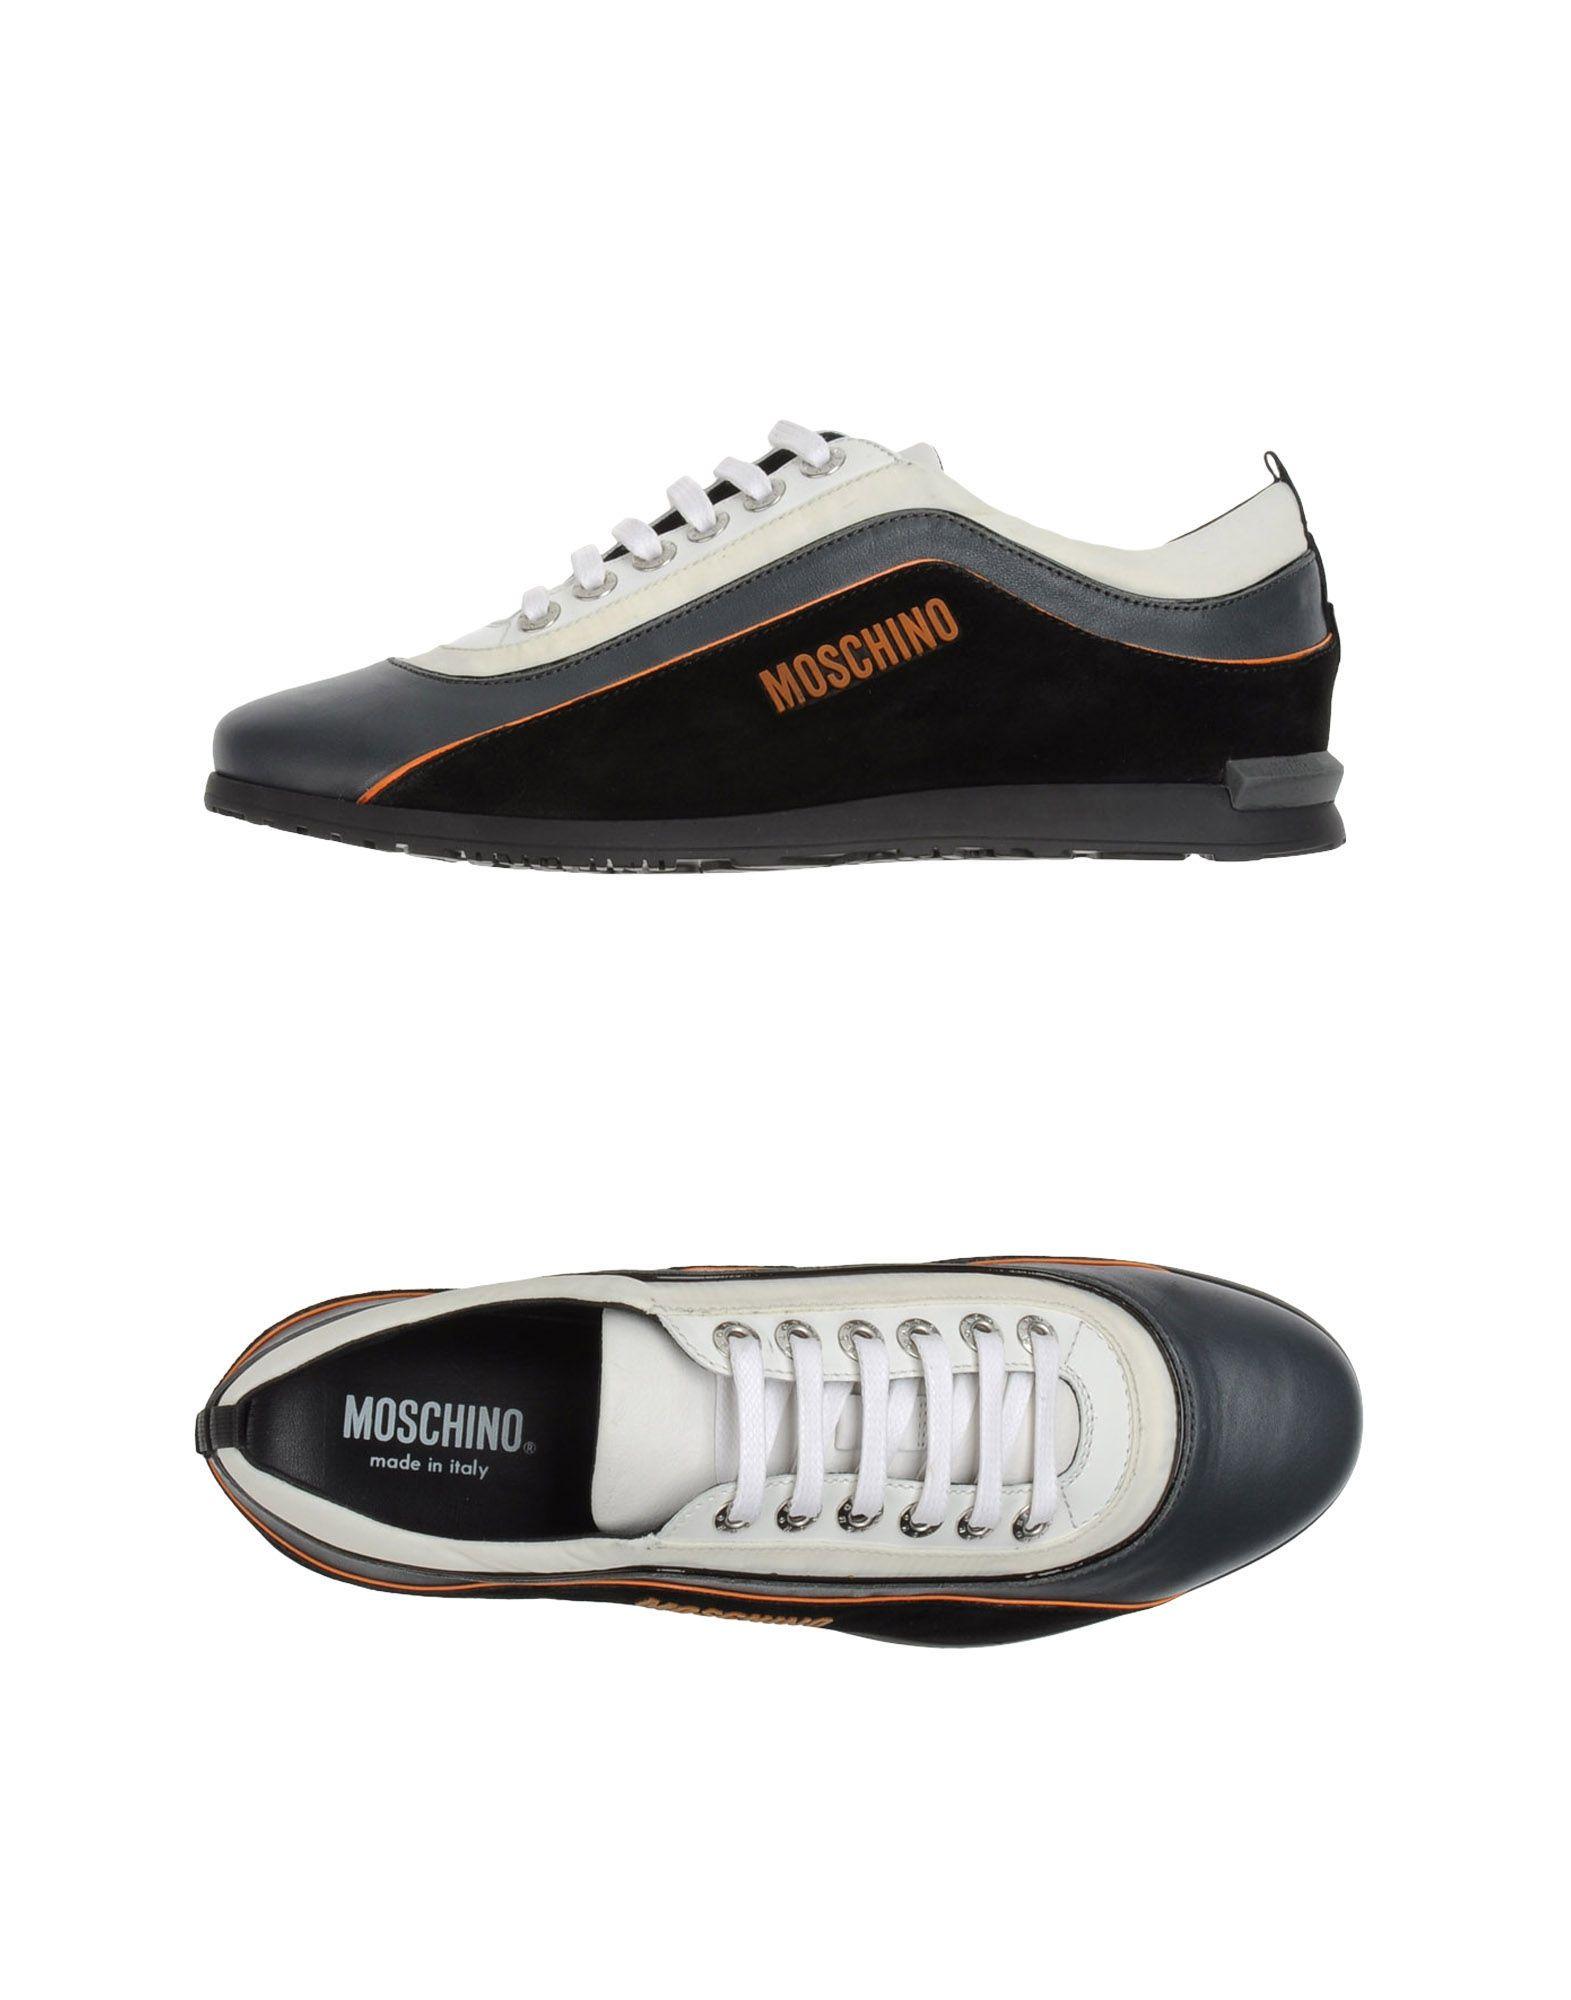 Moschino Men - Footwear - Sneakers